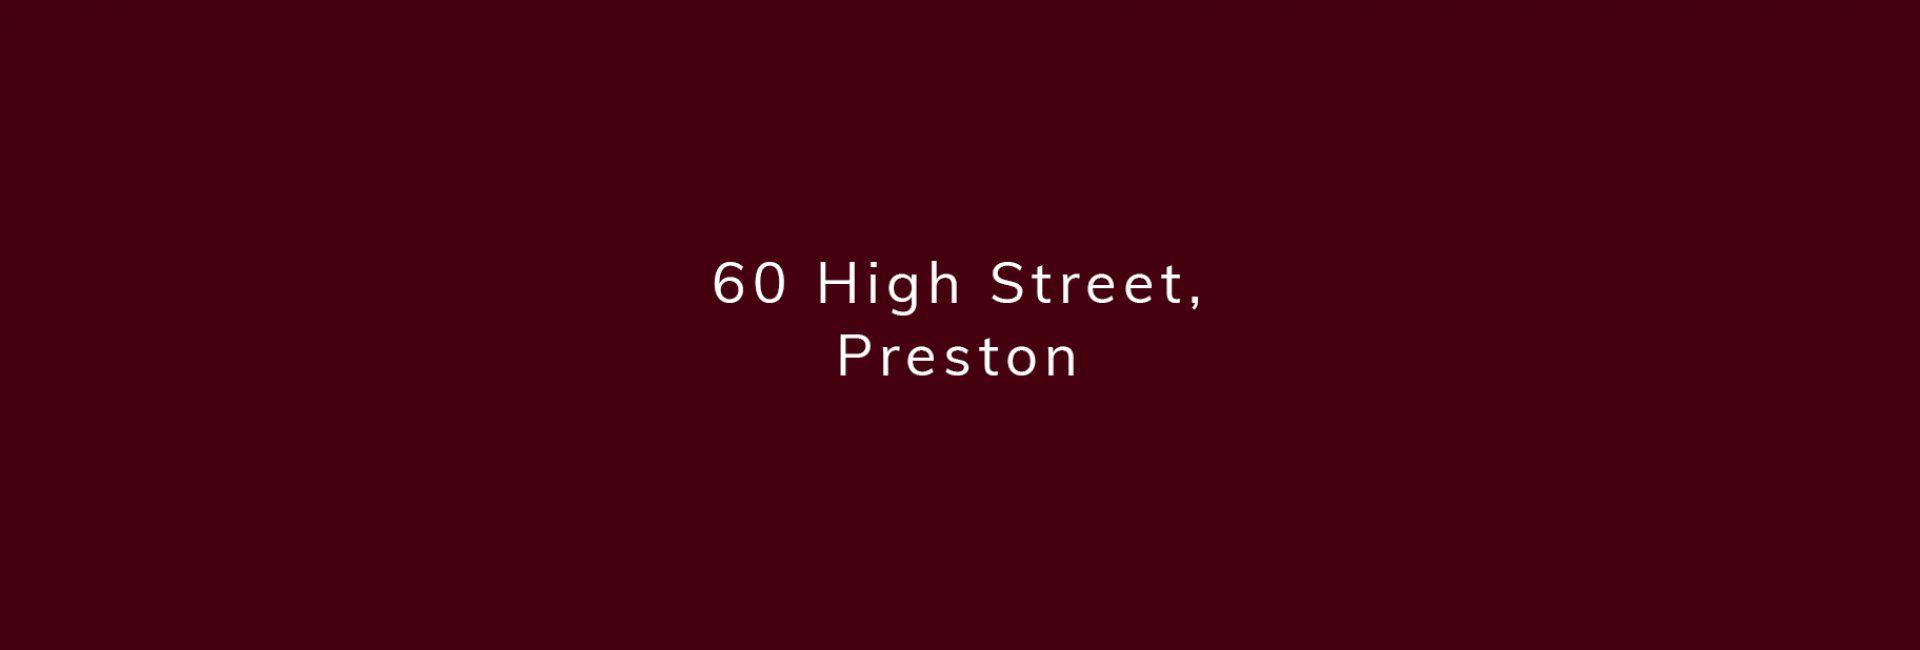 high-street-preston